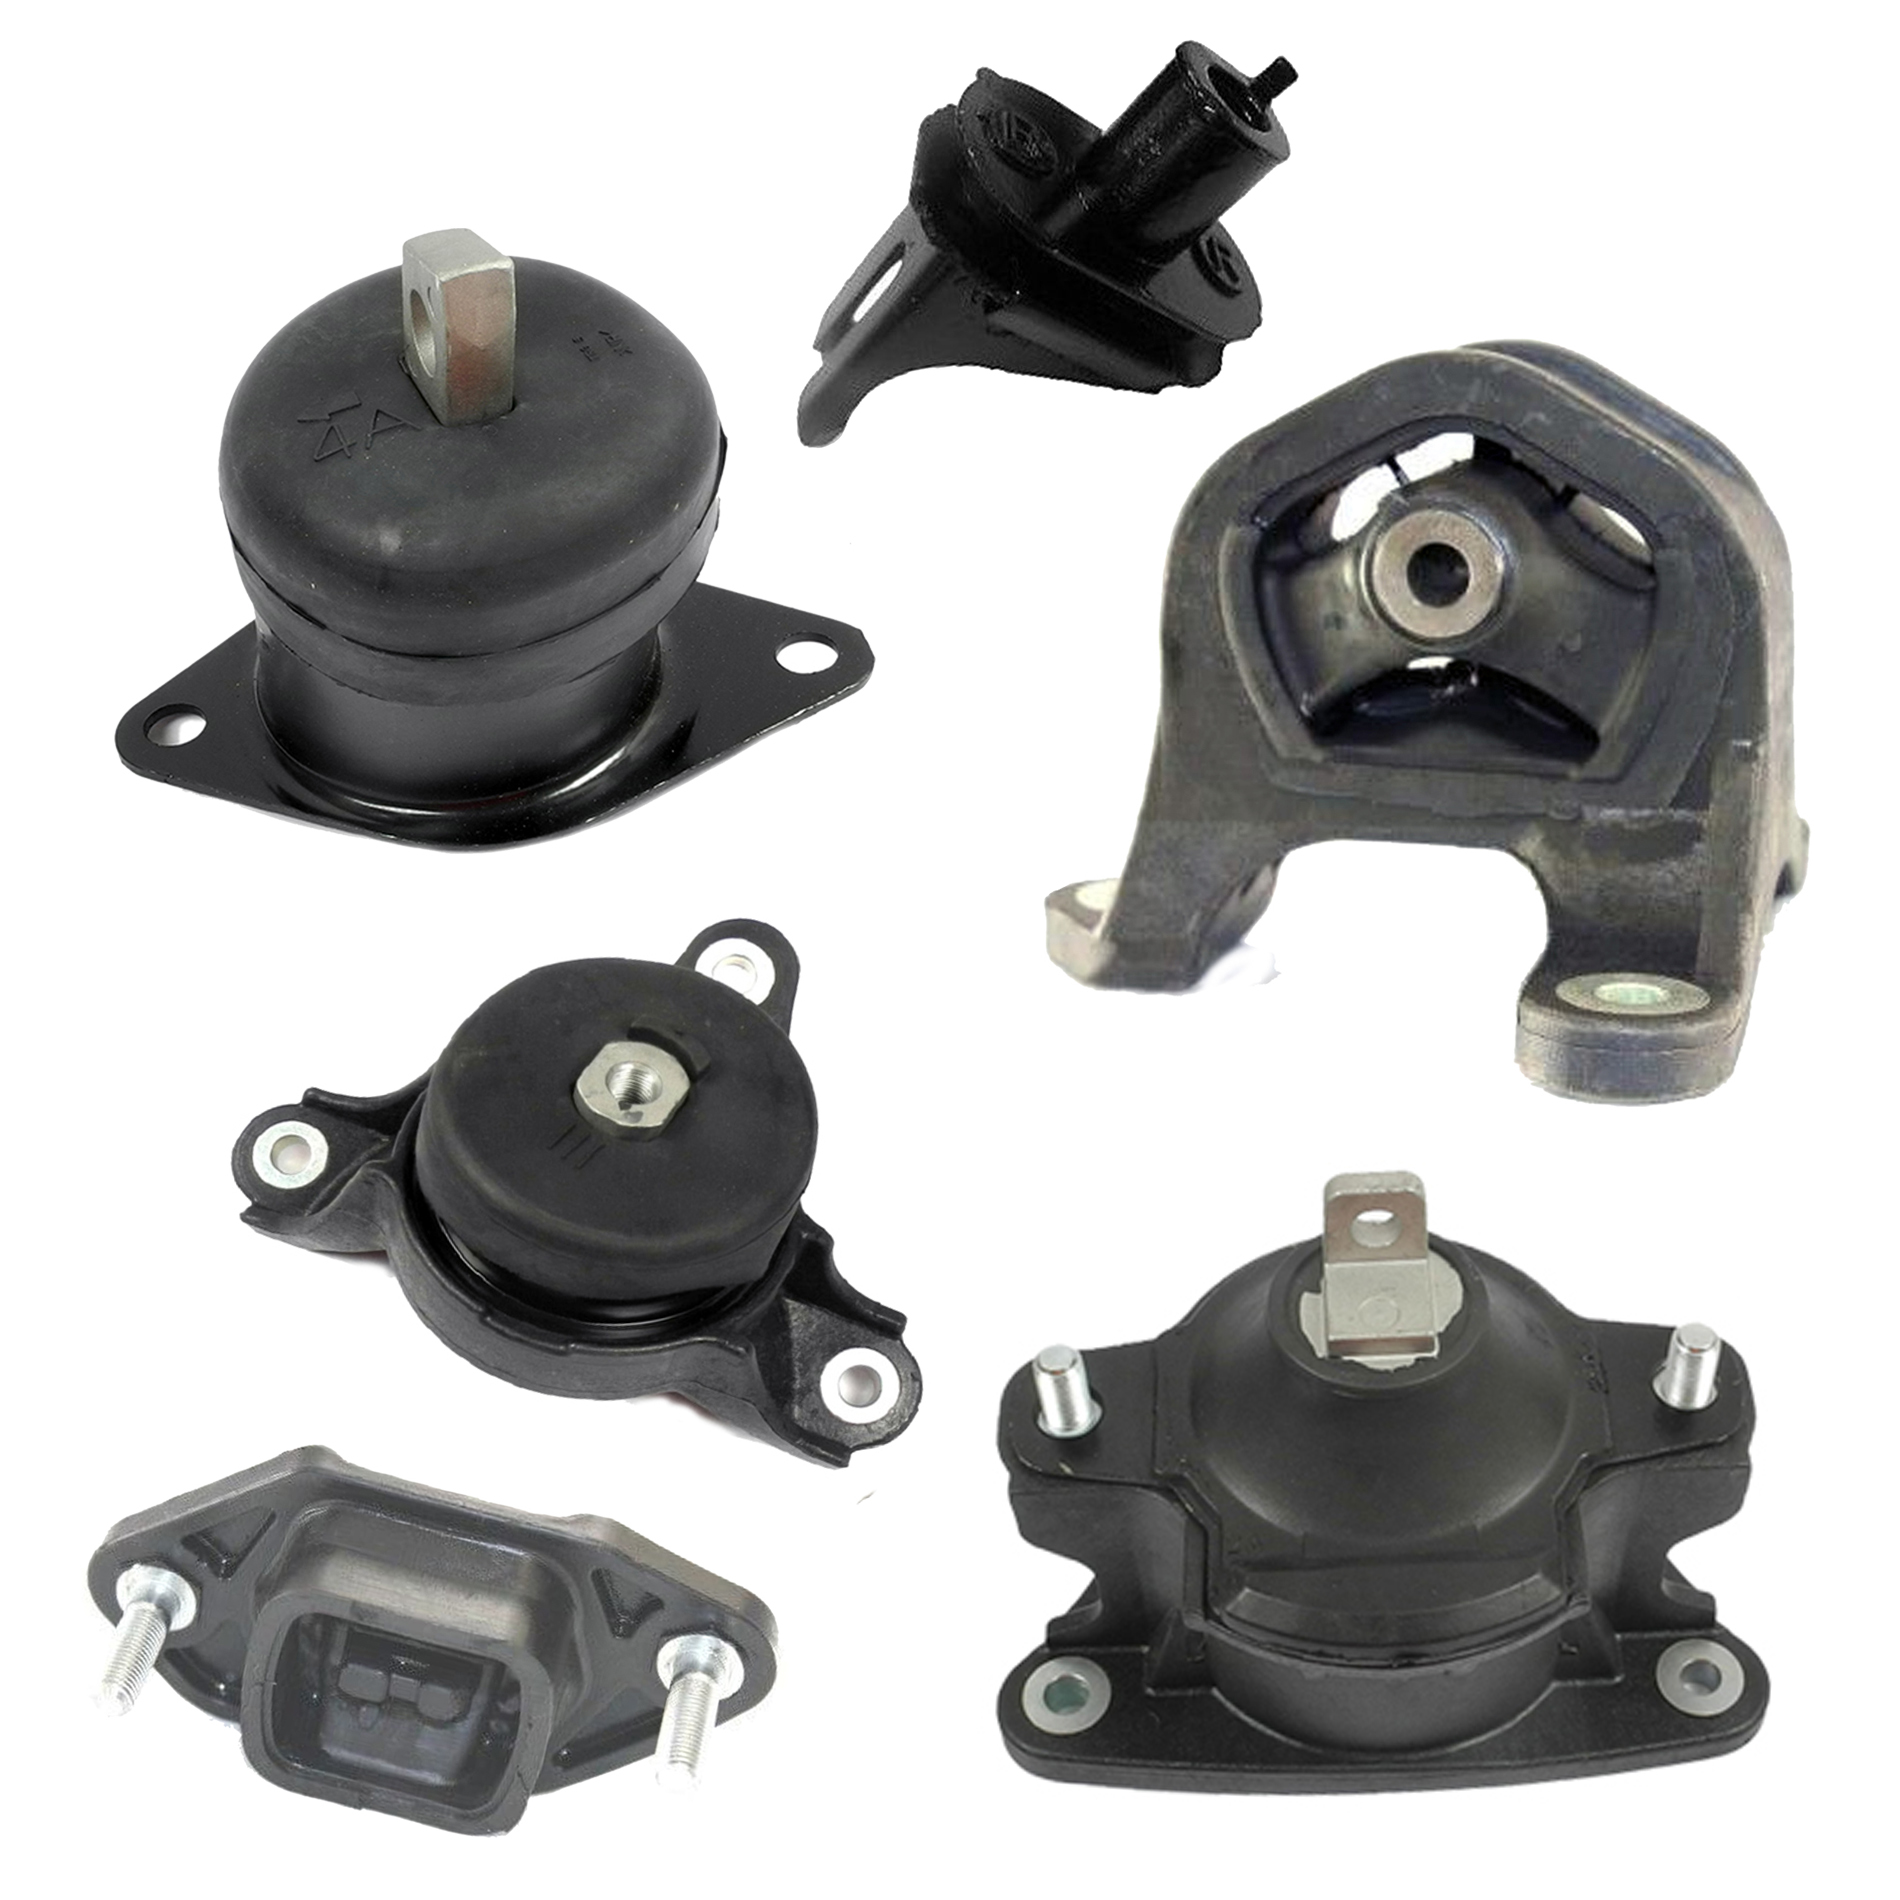 For 06-08 Acura TSX Base Sedan FWD 2.4L Engine Motor /& Trans Mount Set 4PCs